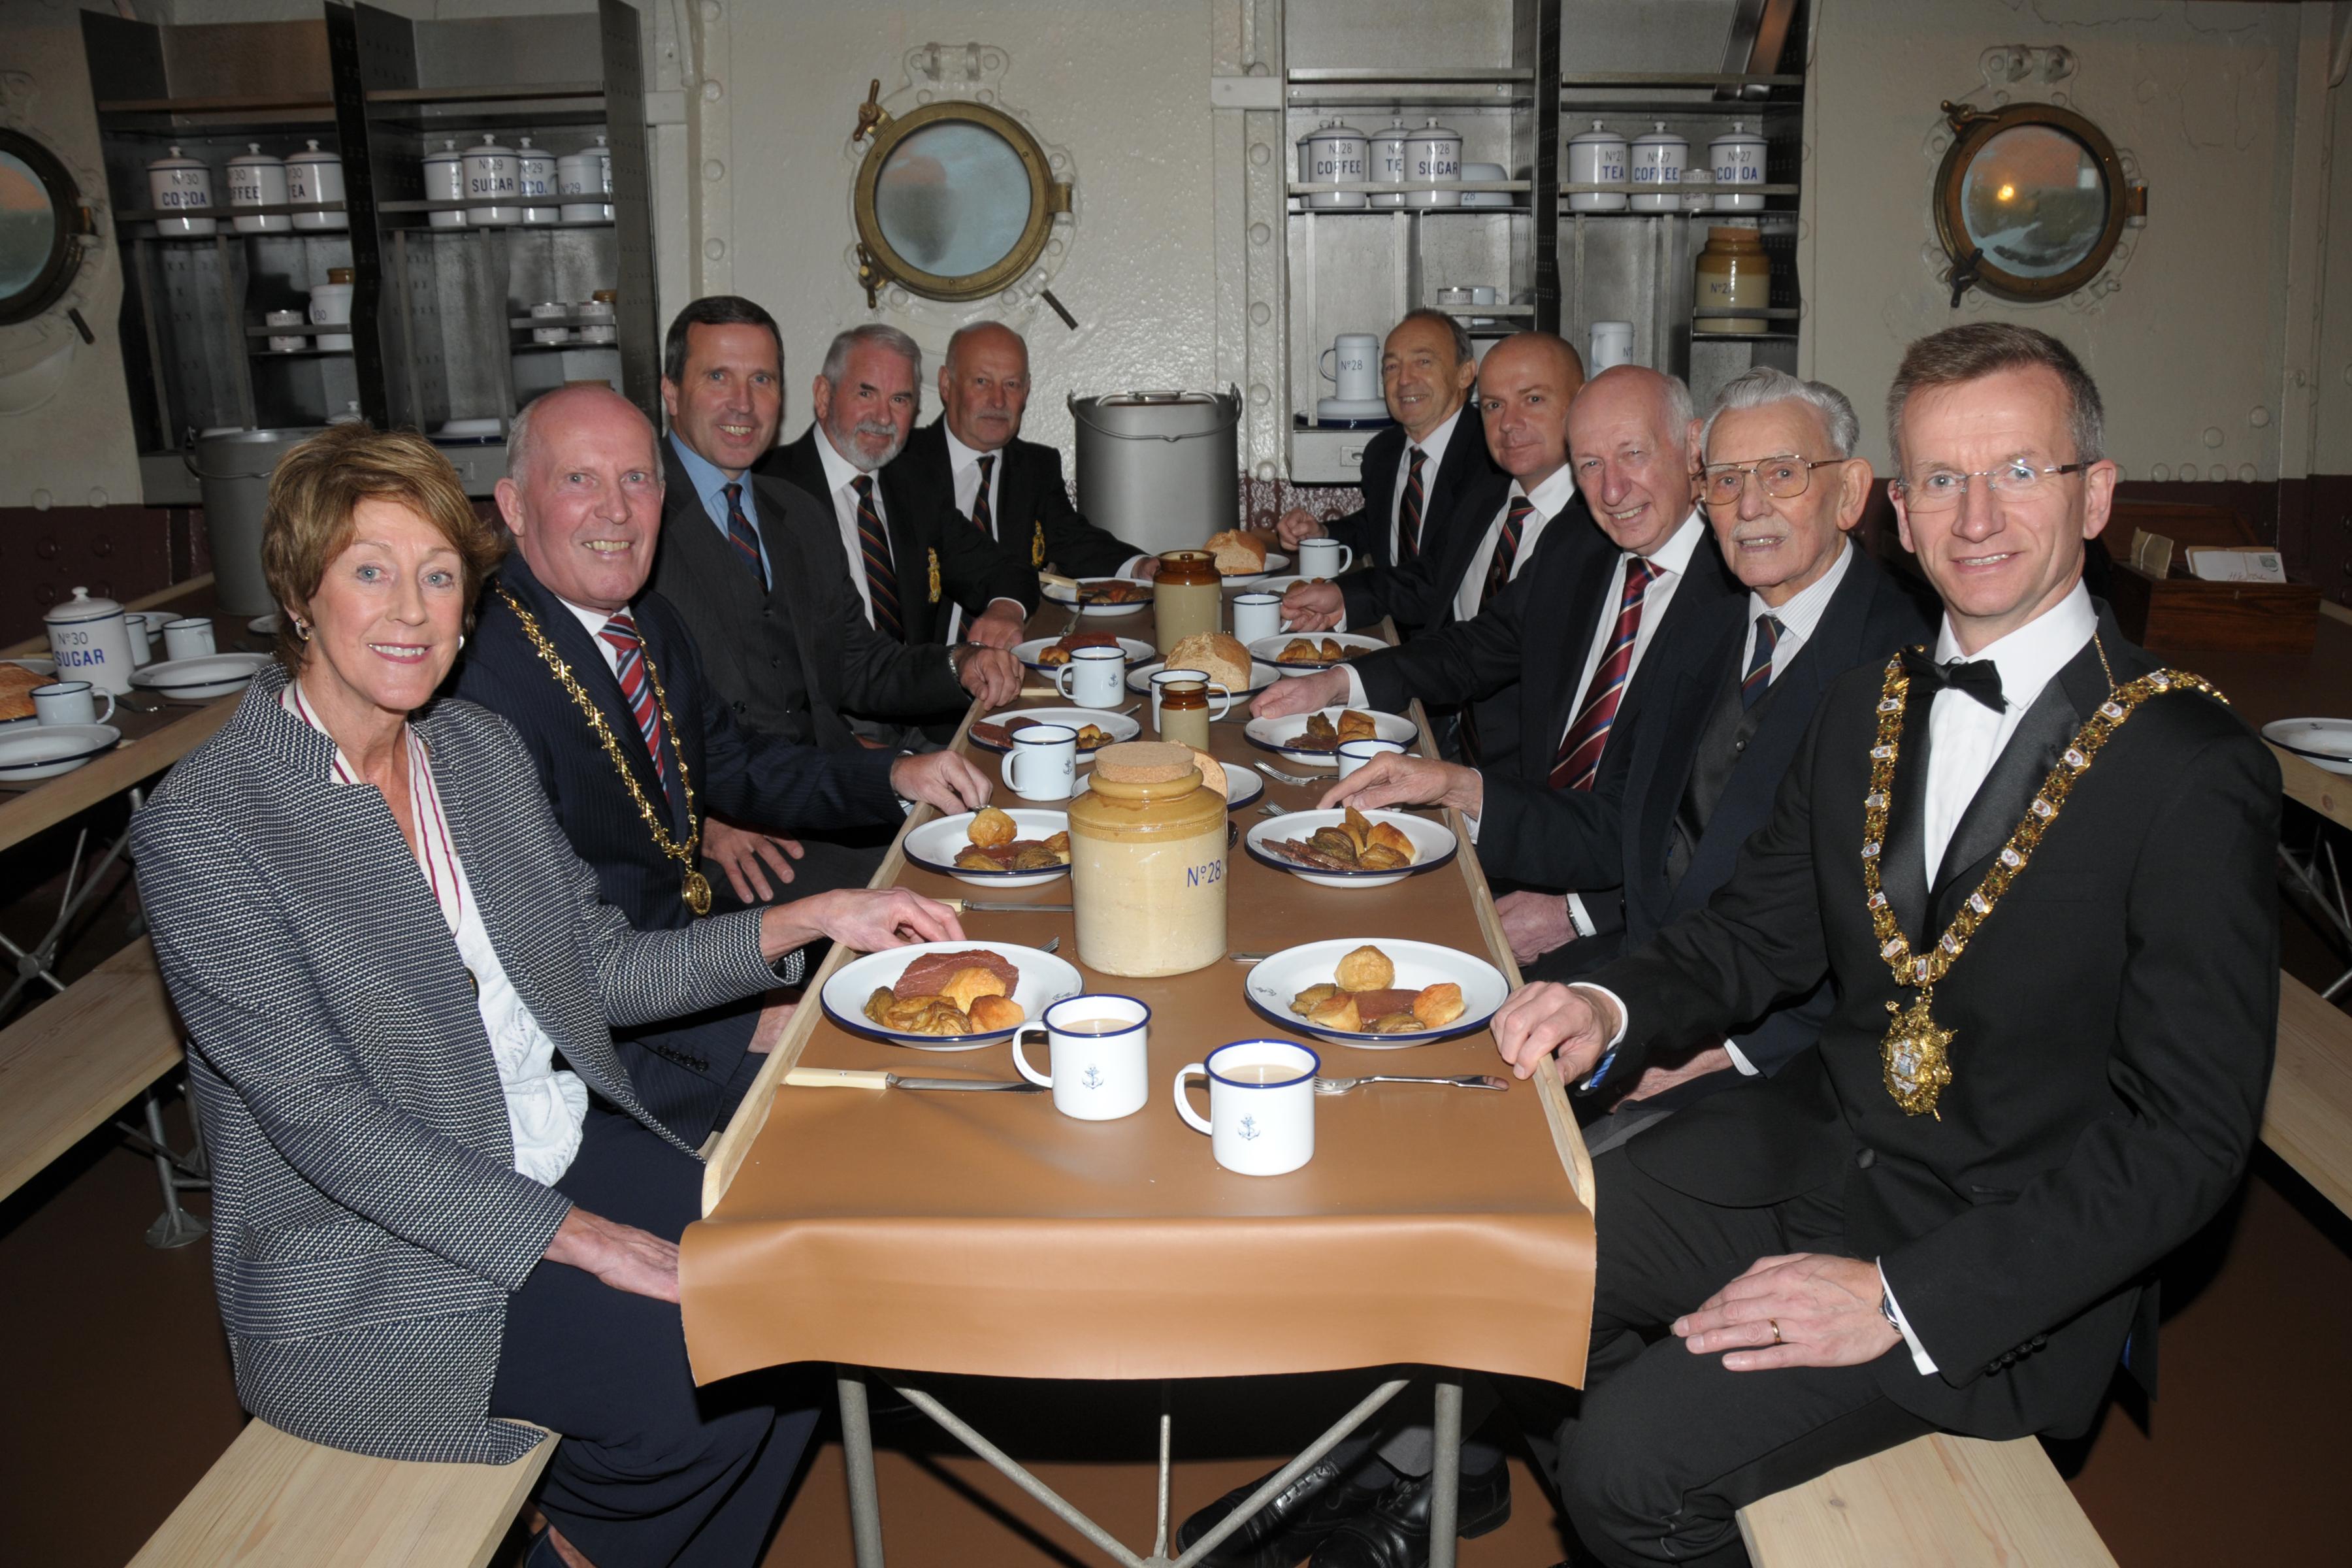 Judith Eve CBE DL attended the Royal Marines Association of Ireland reception on board HMS Caroline in 15th October 2016.